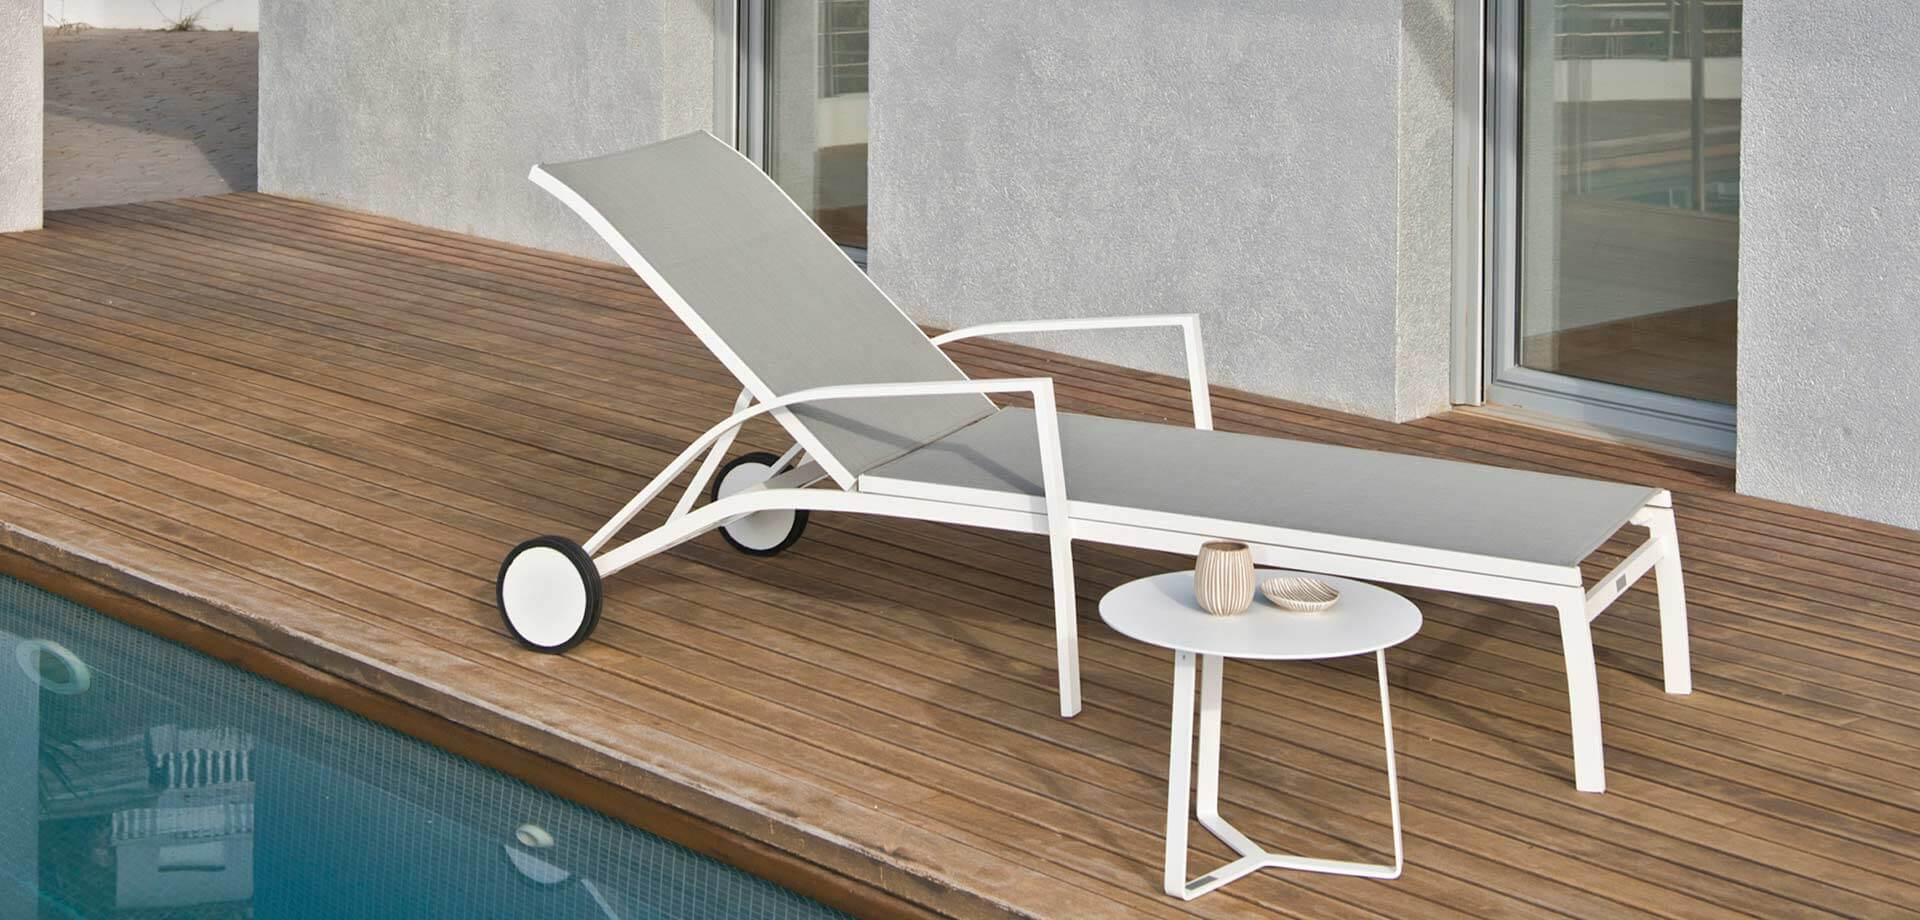 STREAMER - Sun Bed Chair